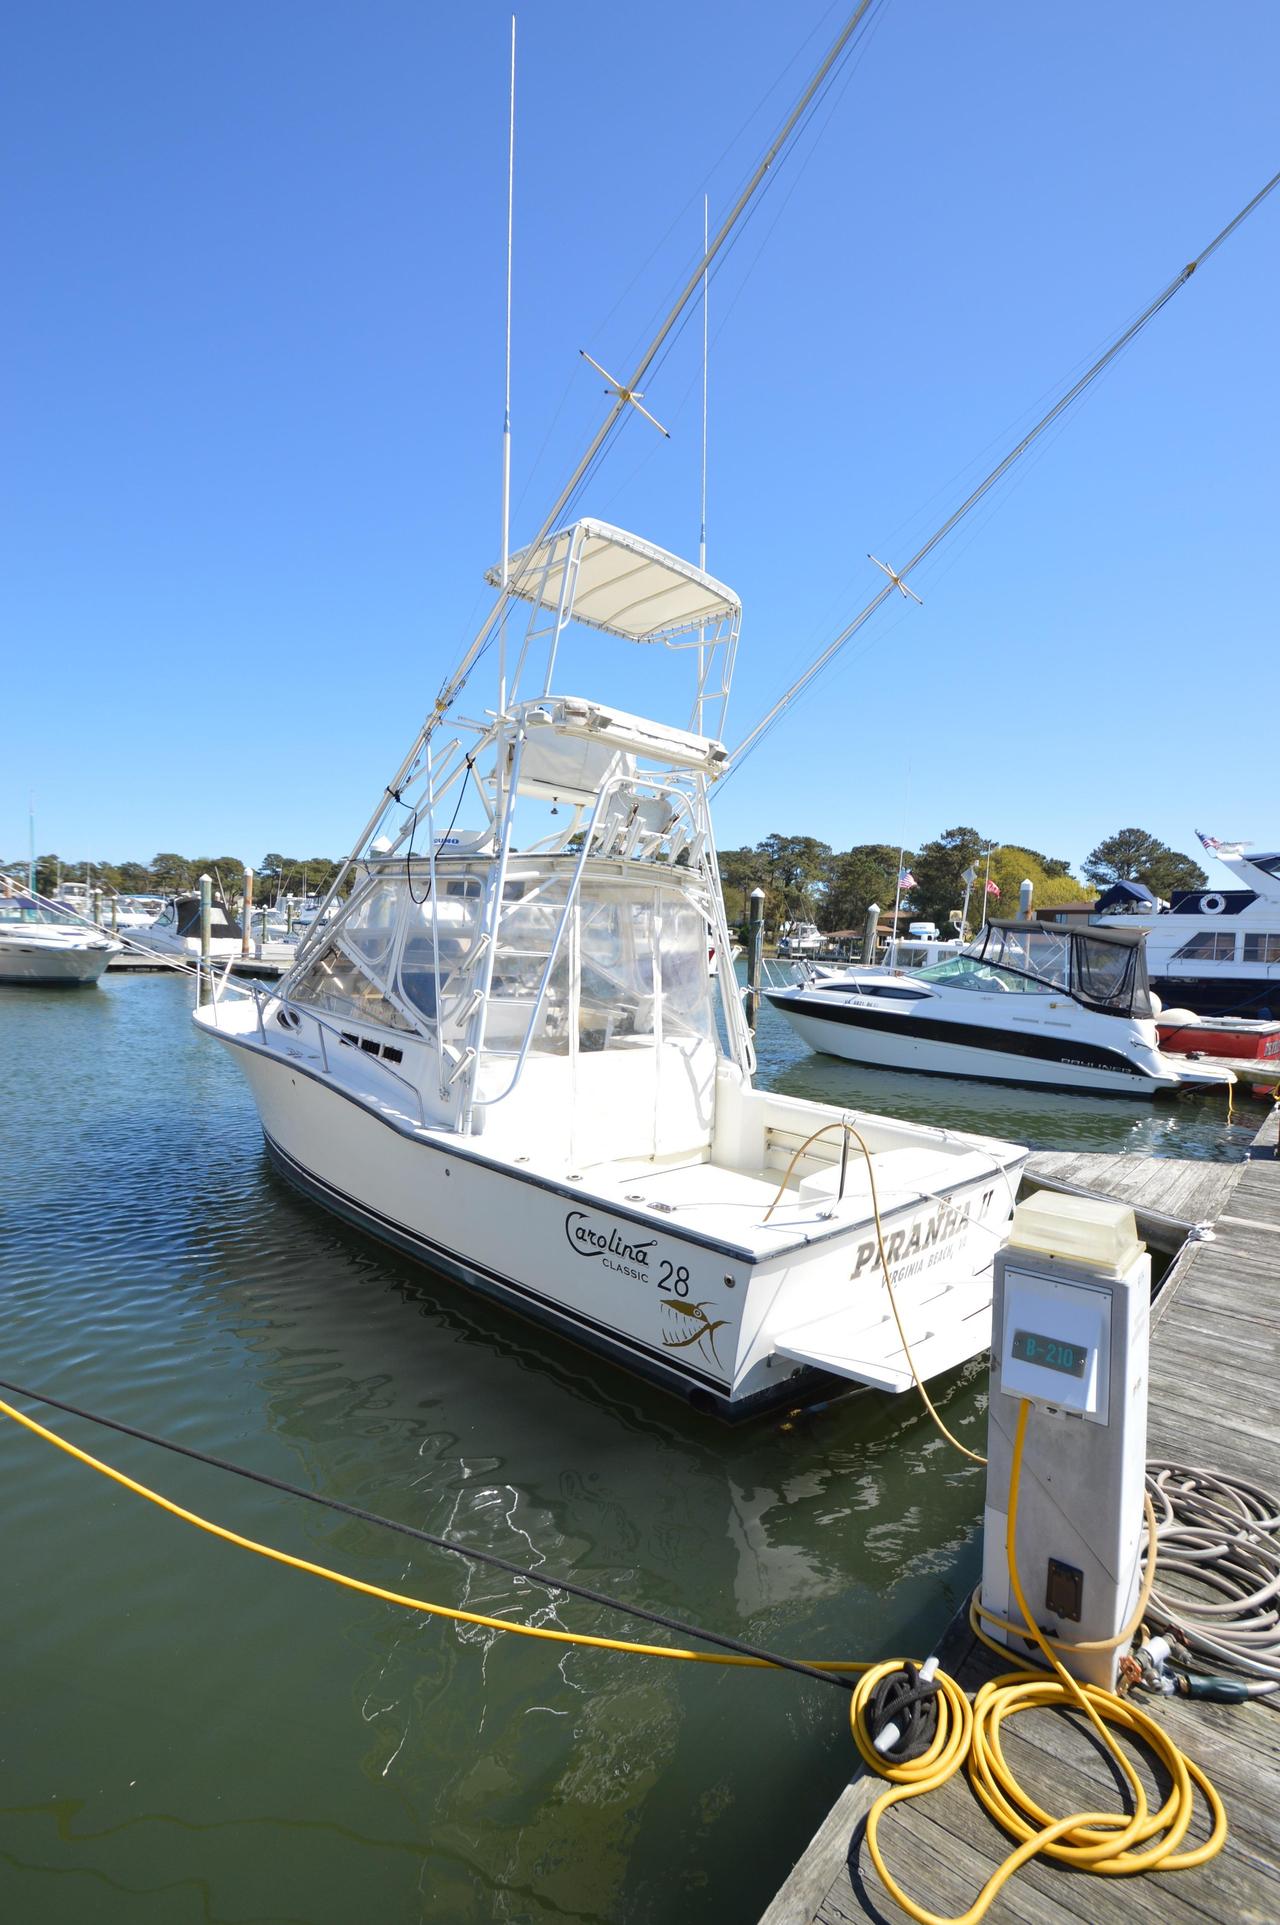 2003 used carolina classic 28 saltwater fishing boat for for Saltwater fishing boats for sale